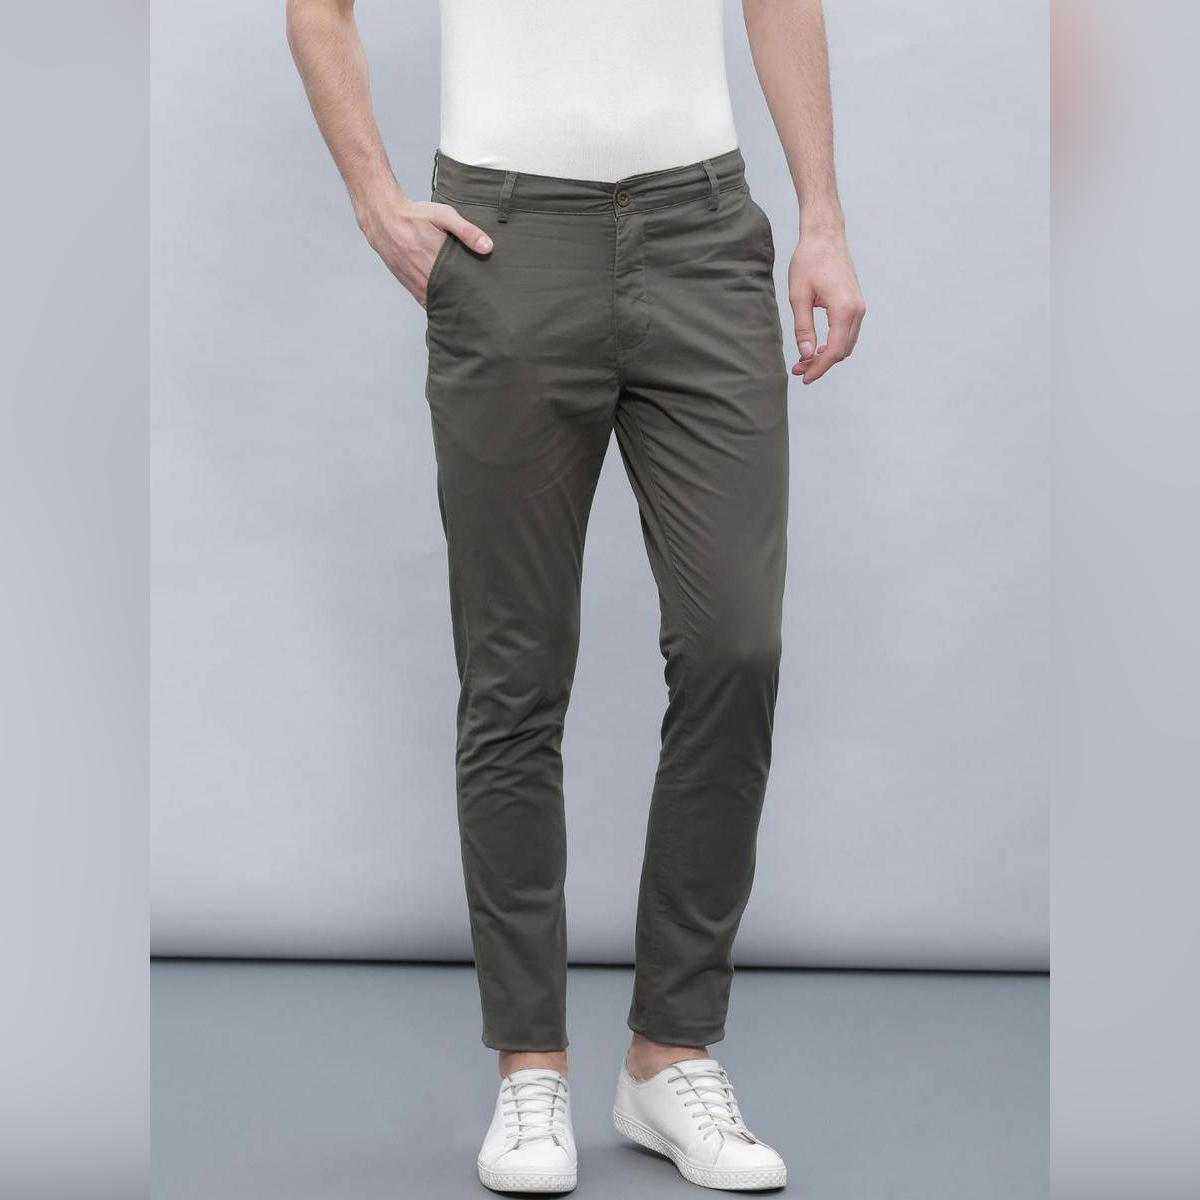 Slimfit Grey Stretchable Cotton Chinos